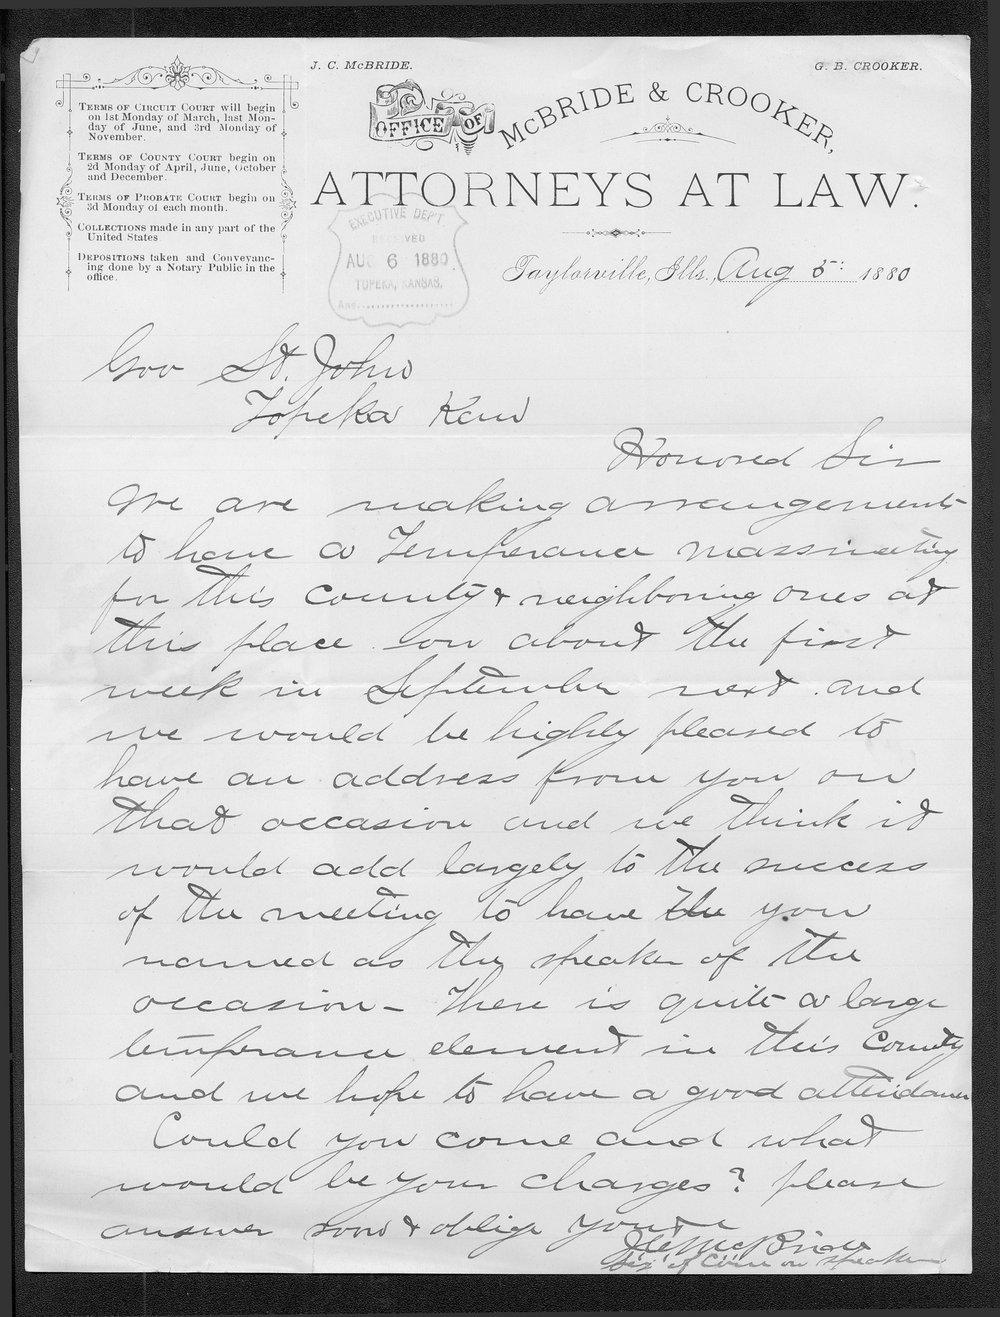 J. C. McBride to Governor John St. John